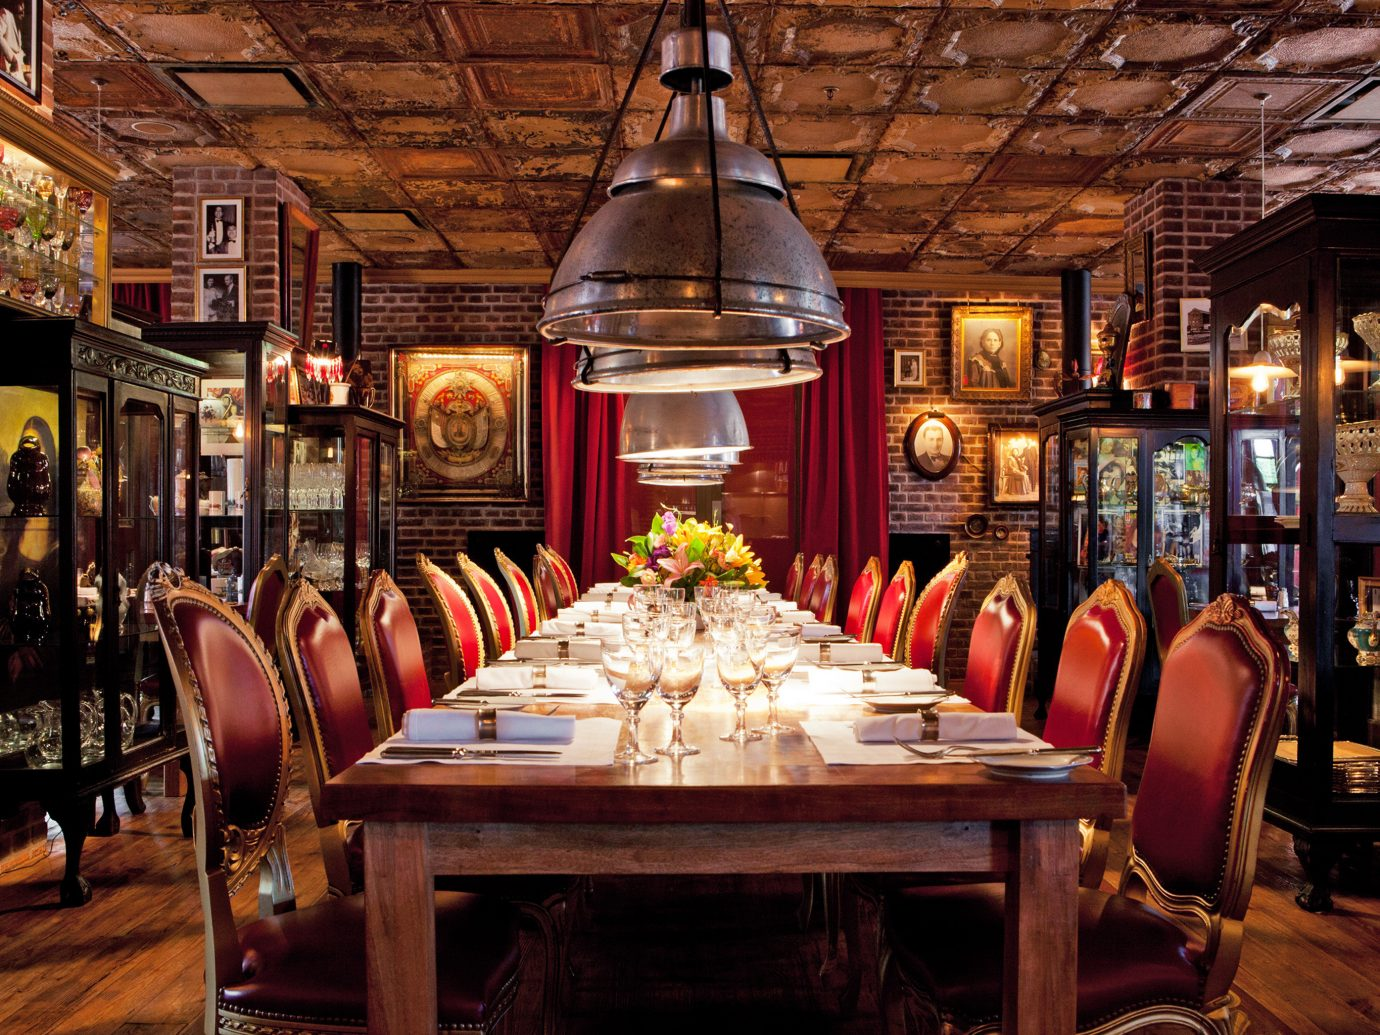 Cultural Dining Drink Elegant Historic Hotels Luxury Romance table building indoor restaurant Bar tavern meal several dining room